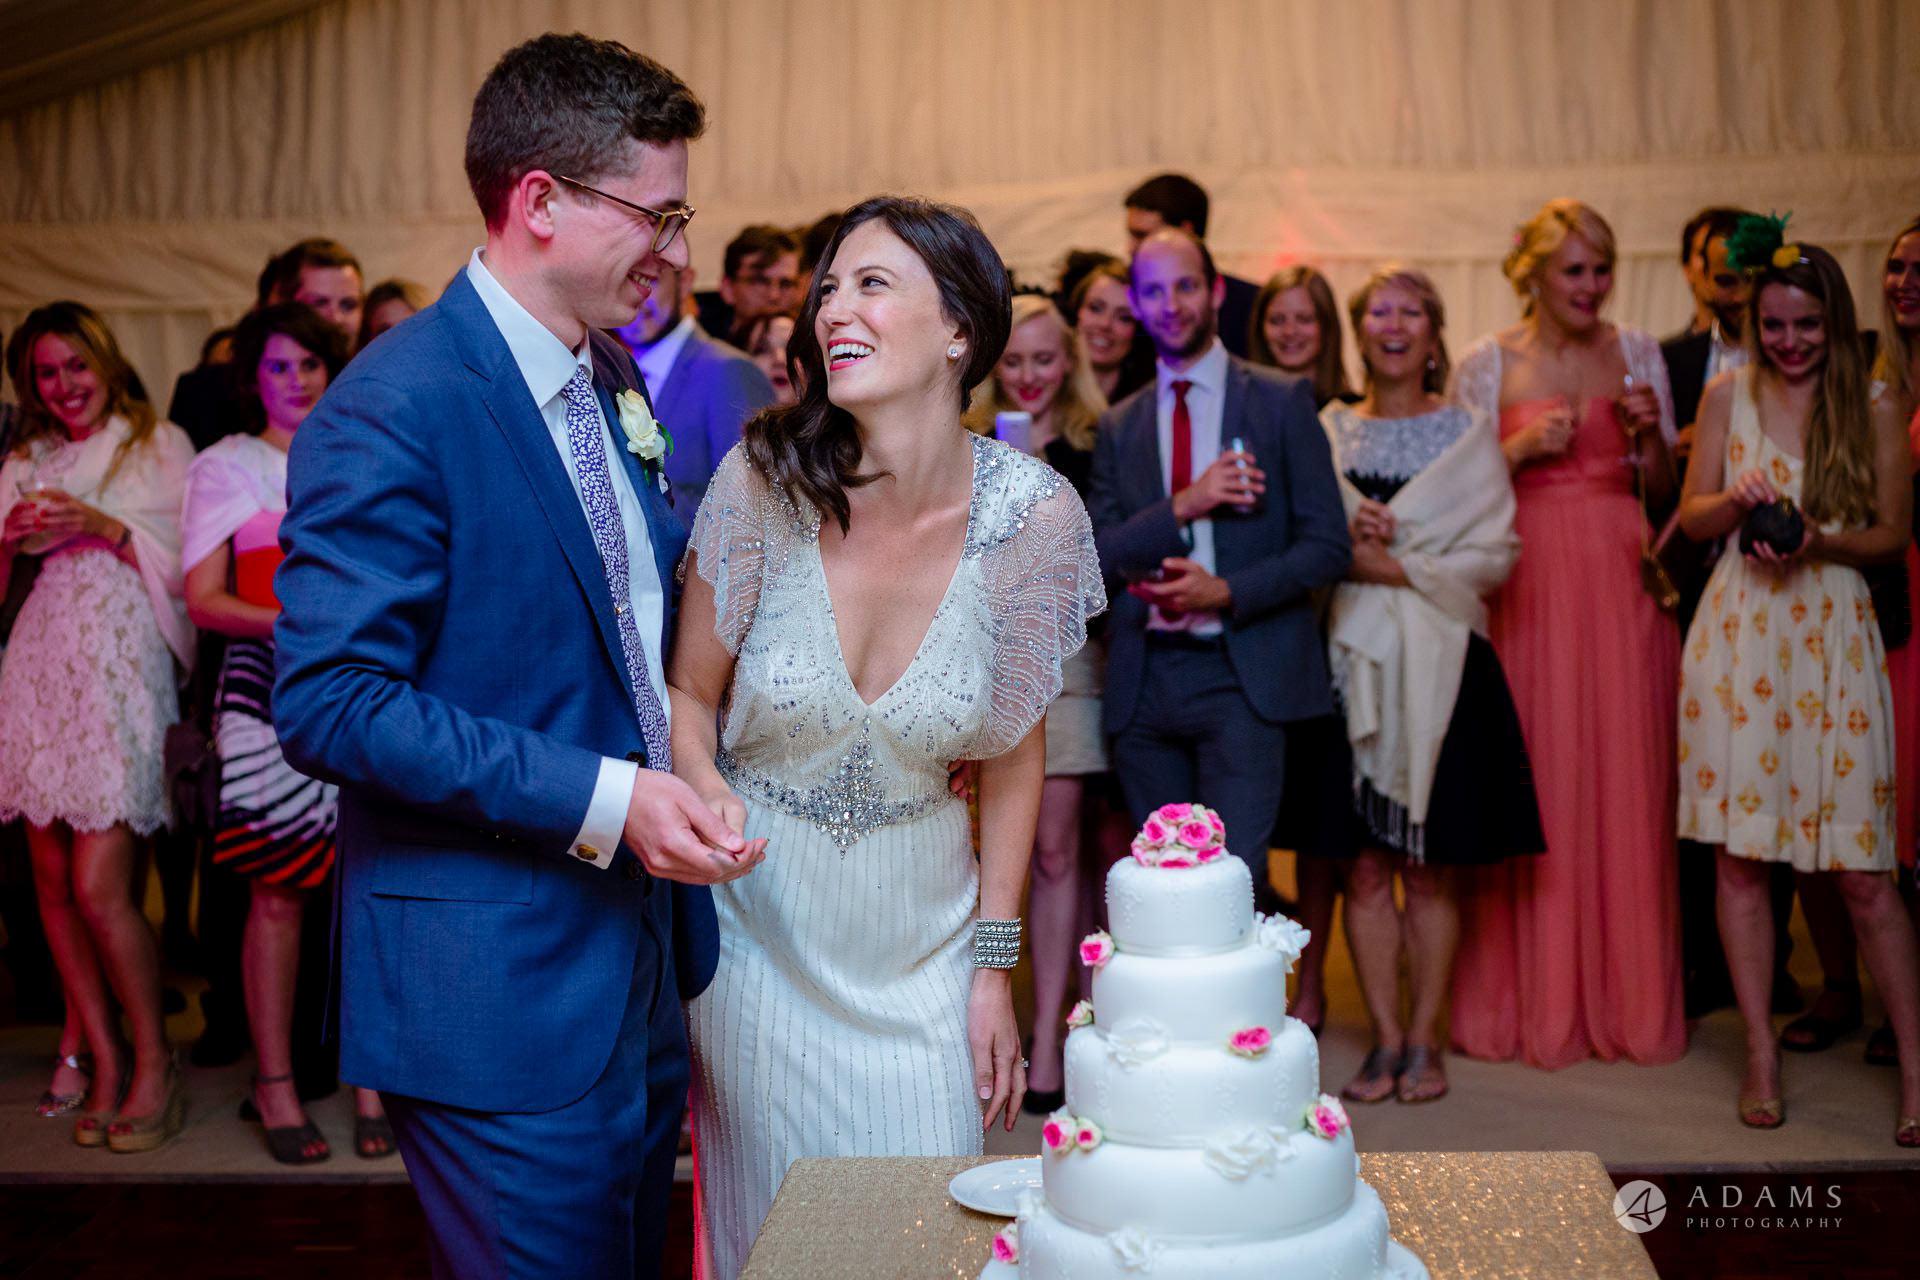 Clare College wedding cake cutting